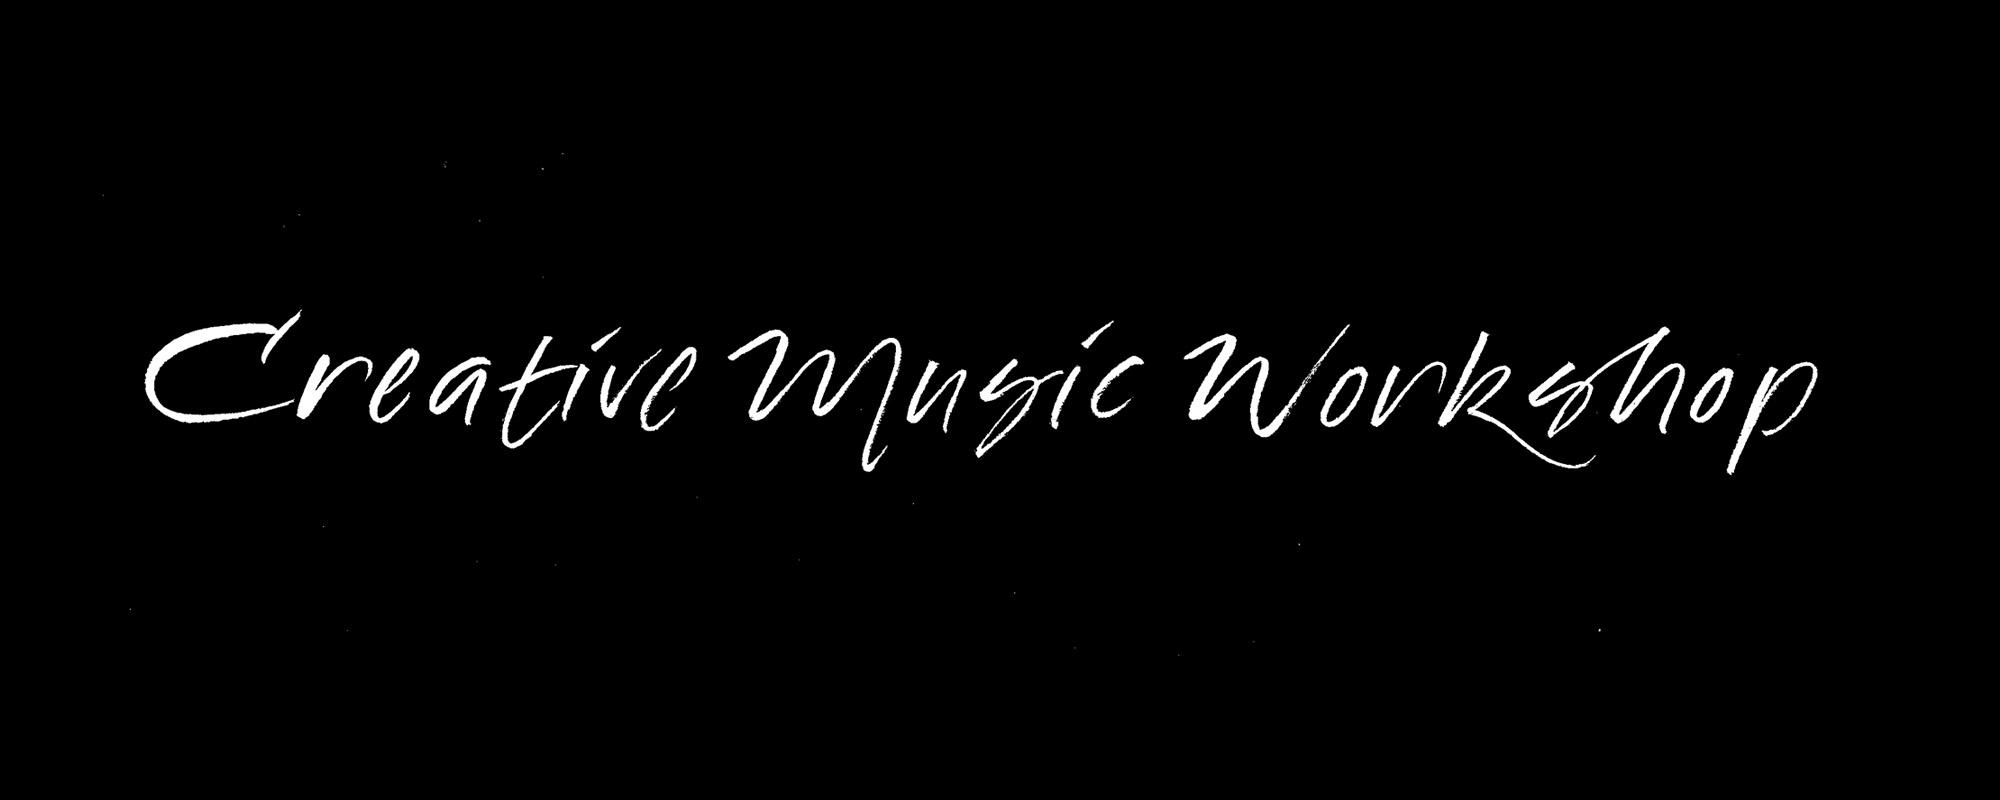 Barbara Bash script - Creative Music Workshops teaching mindfulness and improvisation methods